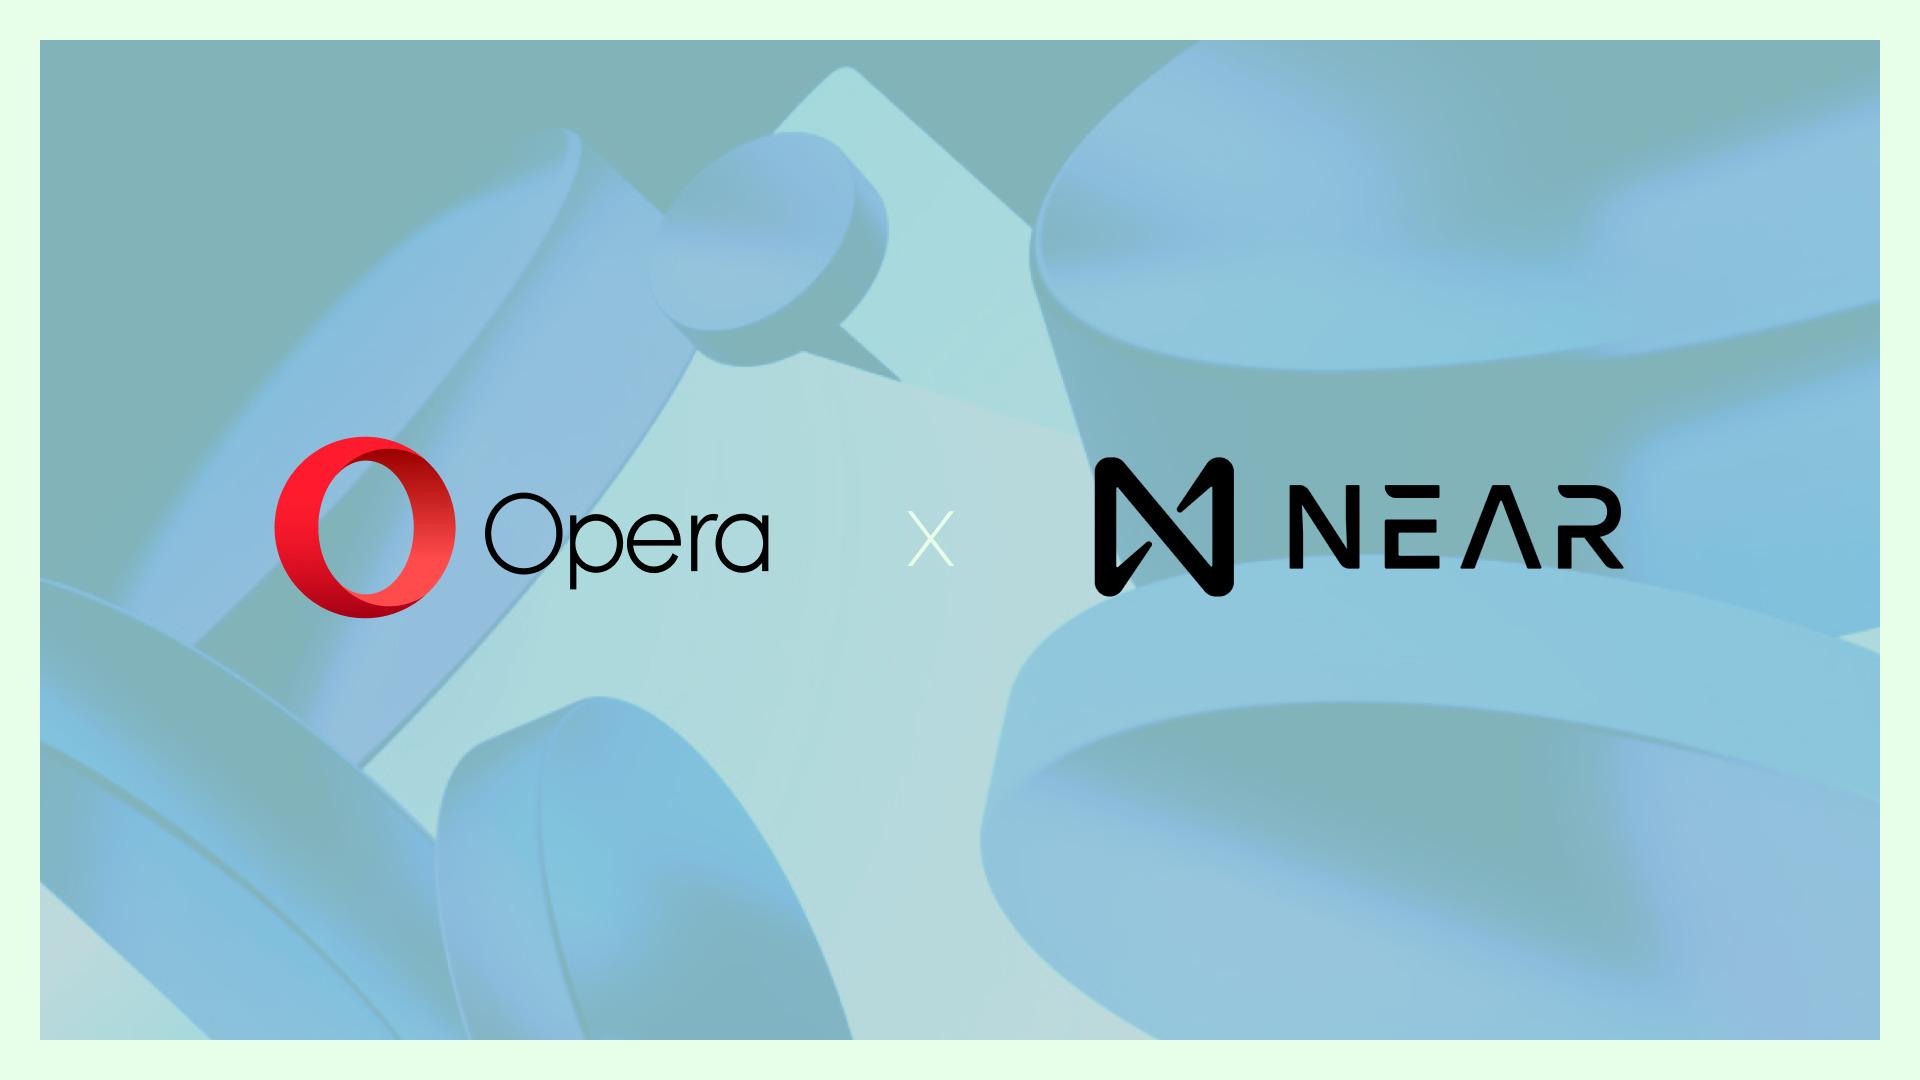 Opera to integrate NEAR protocol